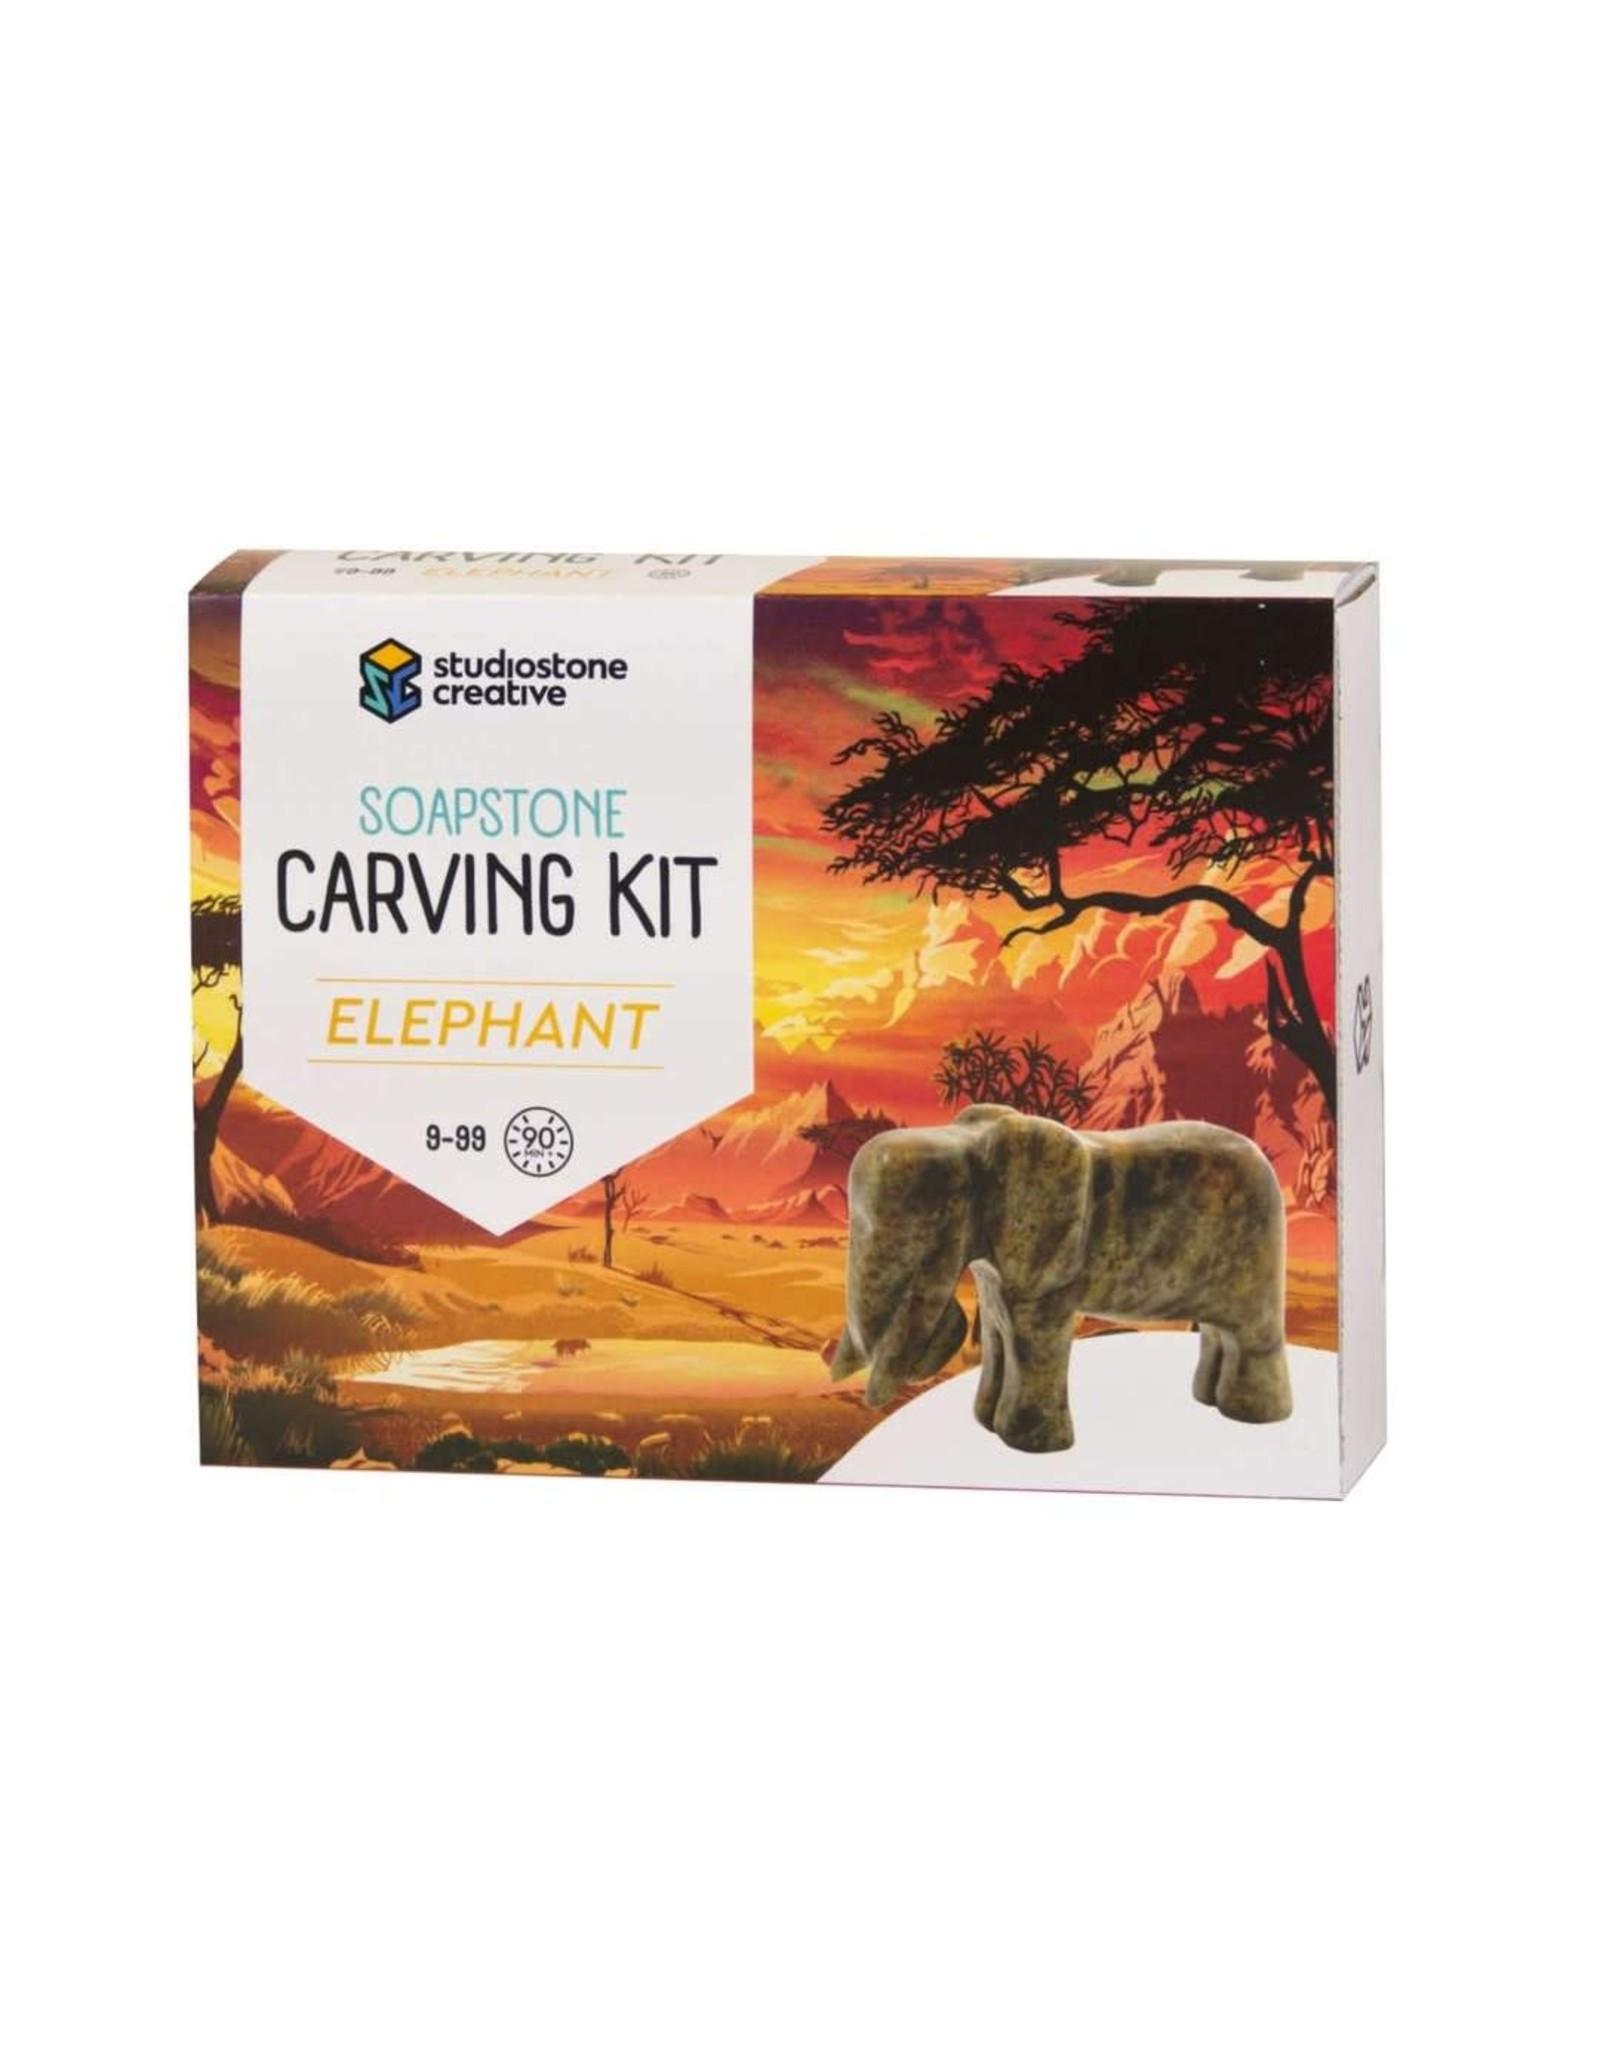 Studiostone Creative Soap stone carving kit - Elephant